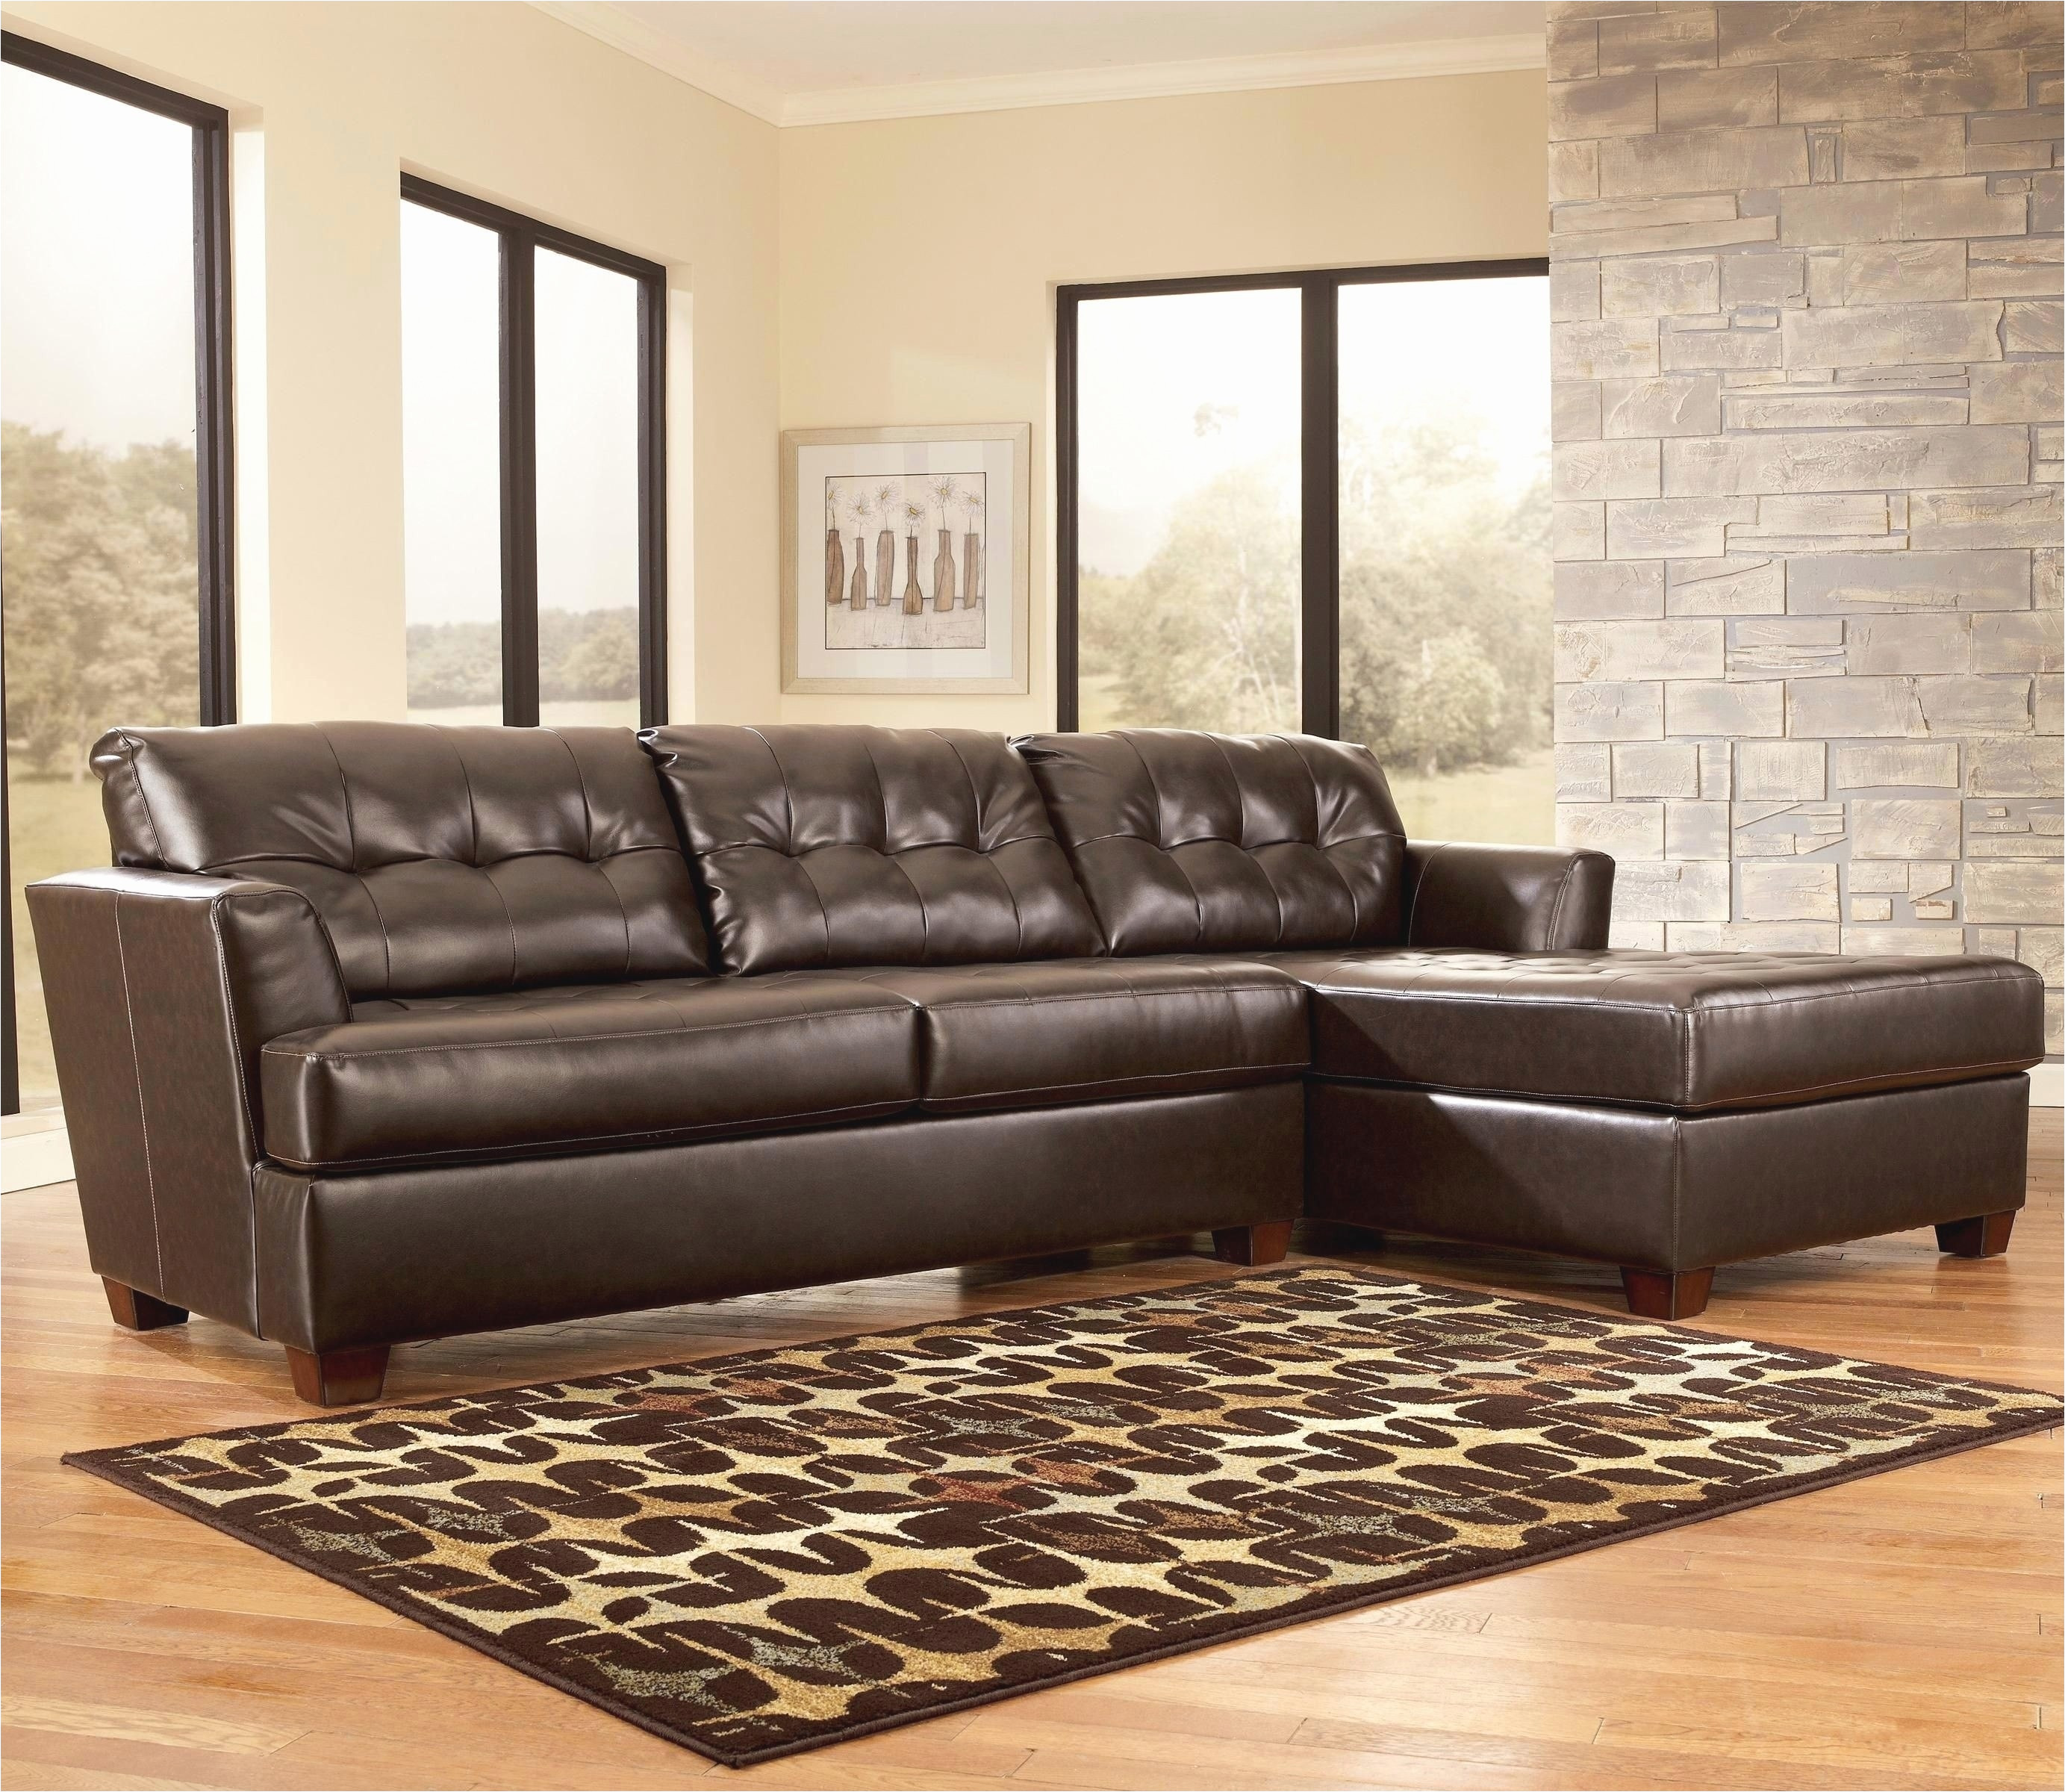 Discount Furniture Stores In Pensacola Florida Pensacola Furniture Stores ashley Furniture Florida Locations